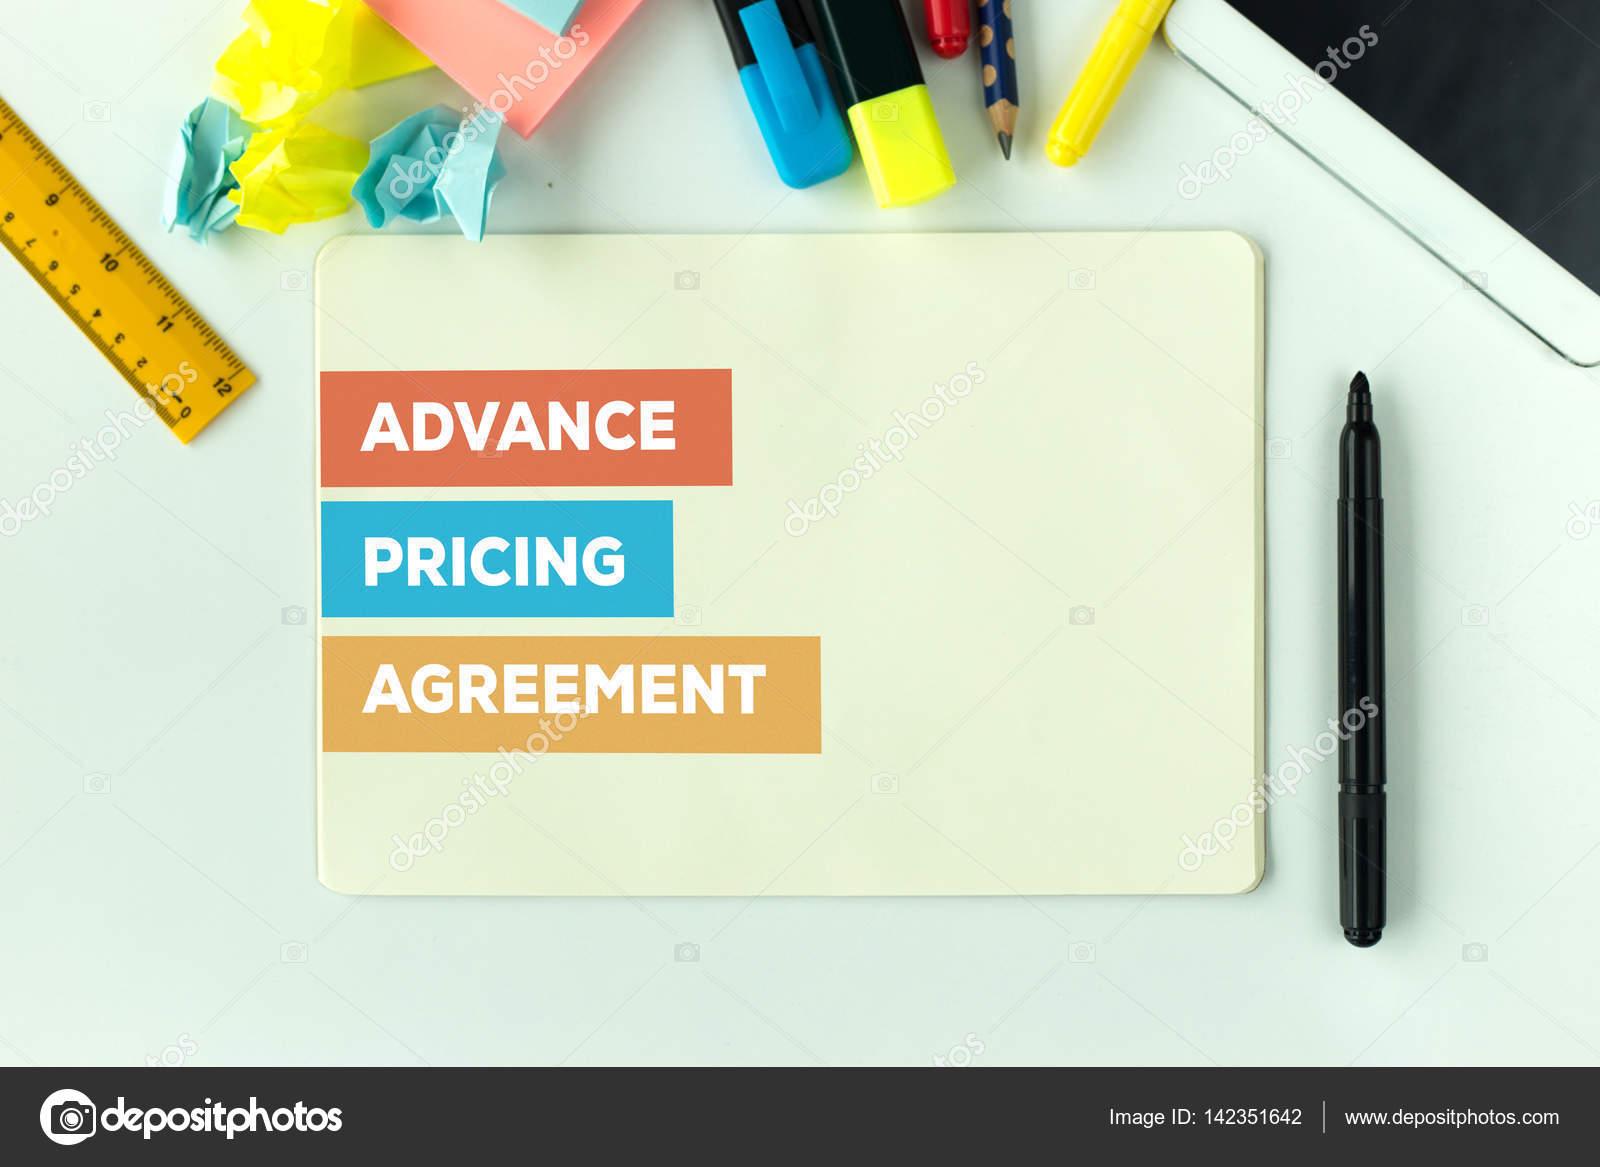 Advance Pricing Agreement Concept Stock Photo Garagestock 142351642